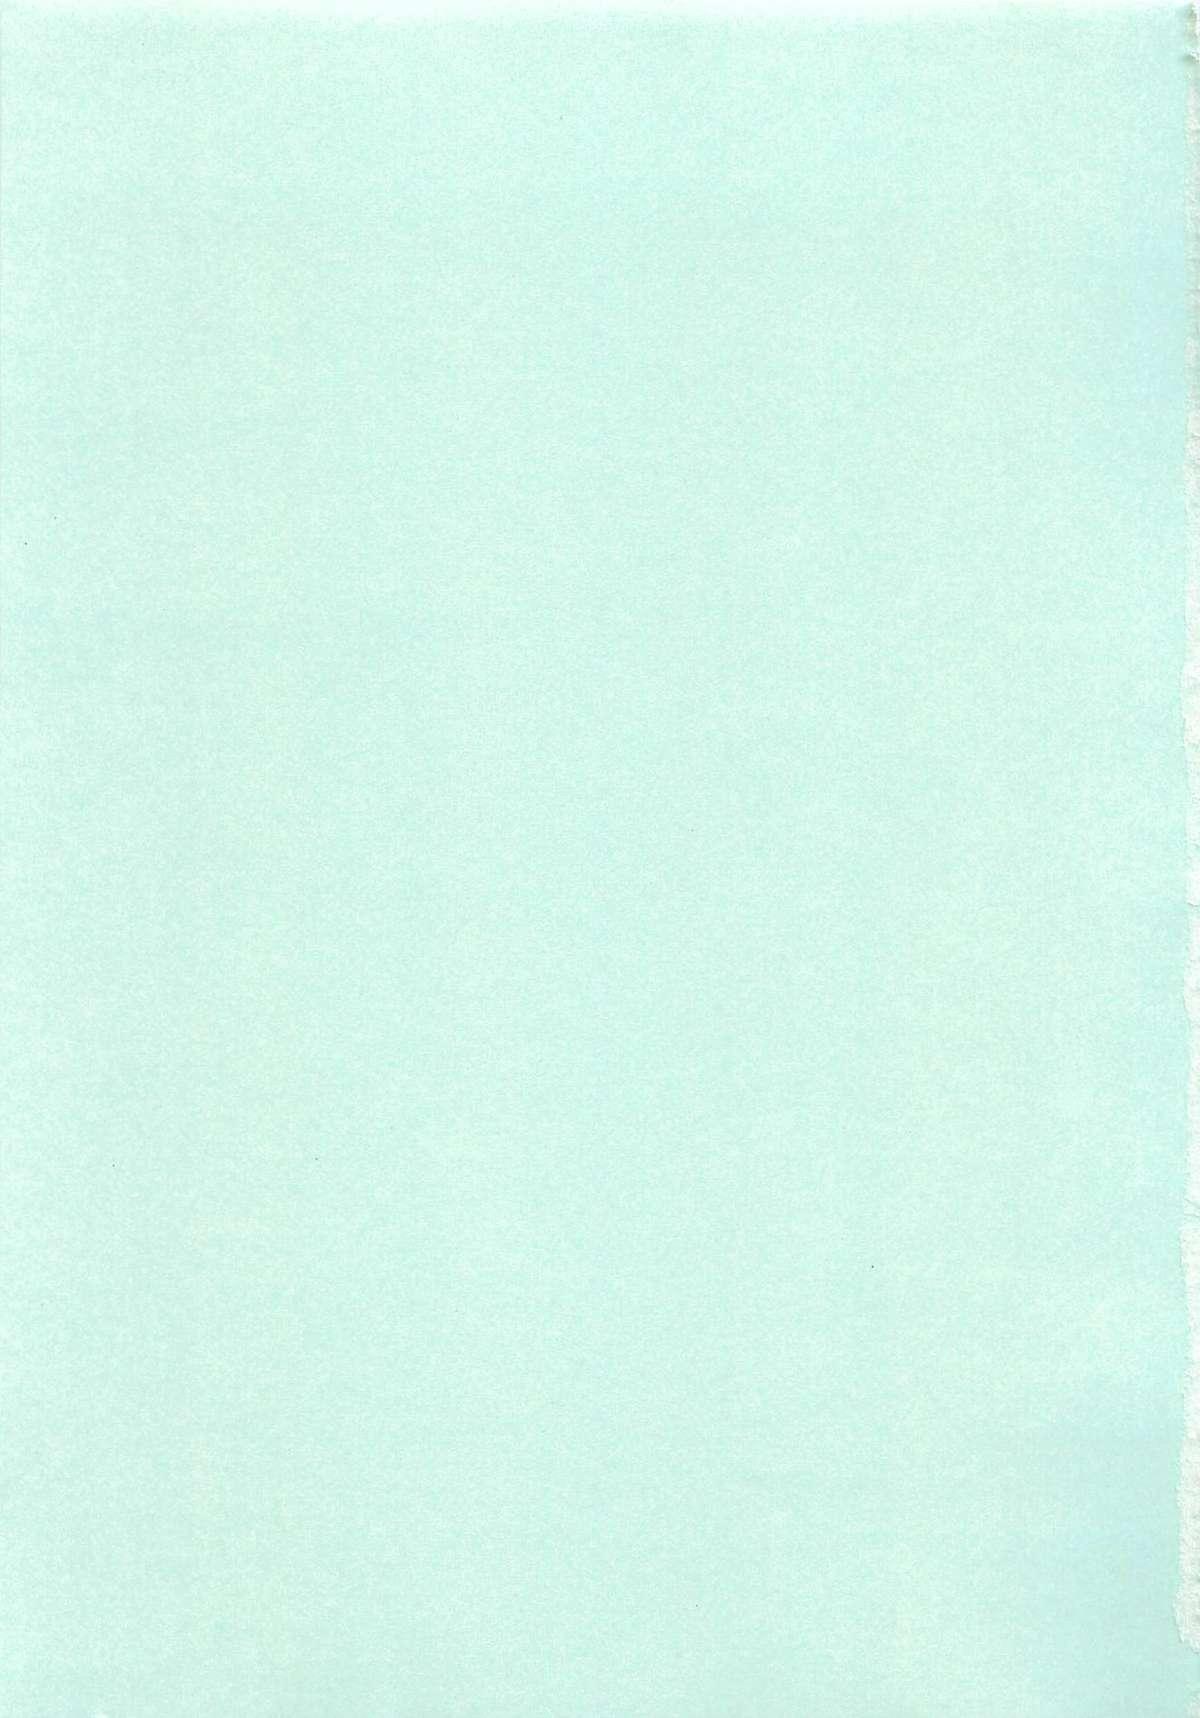 Otokonoko HEAVEN Vol. 02 Dokidoki Chikan Taiken 167